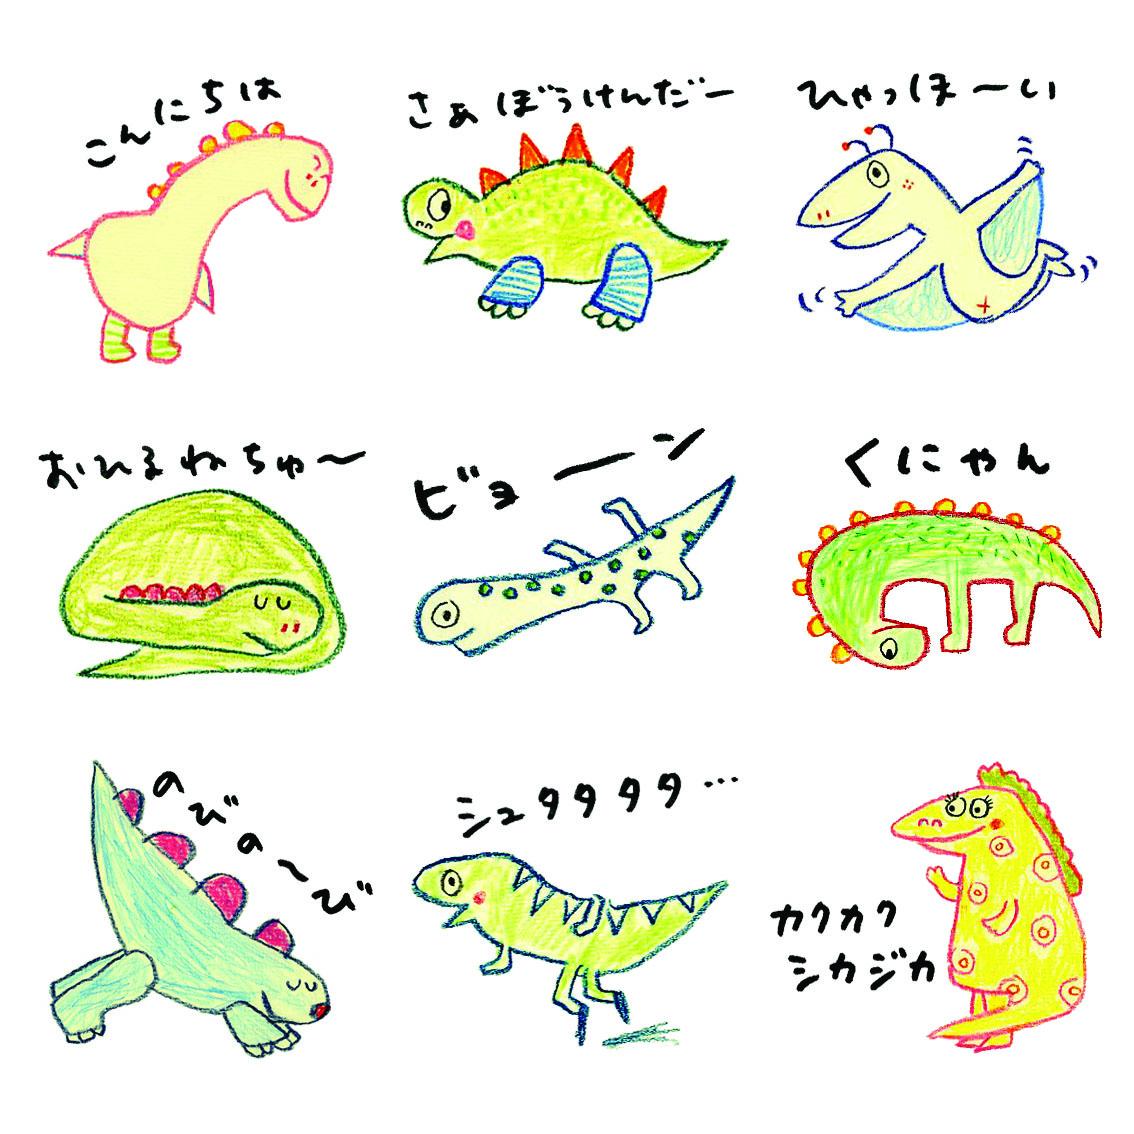 KyopiLand Creatures vol.4 -Dinosaurs-